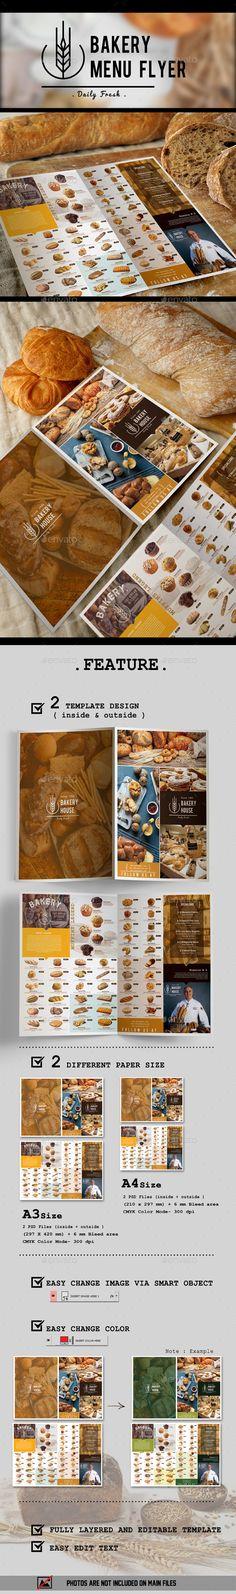 #Bakery Menu Flyer - #Flyers Print Templates Download here: https://graphicriver.net/item/bakery-menu-flyer/16083135?ref=alena994